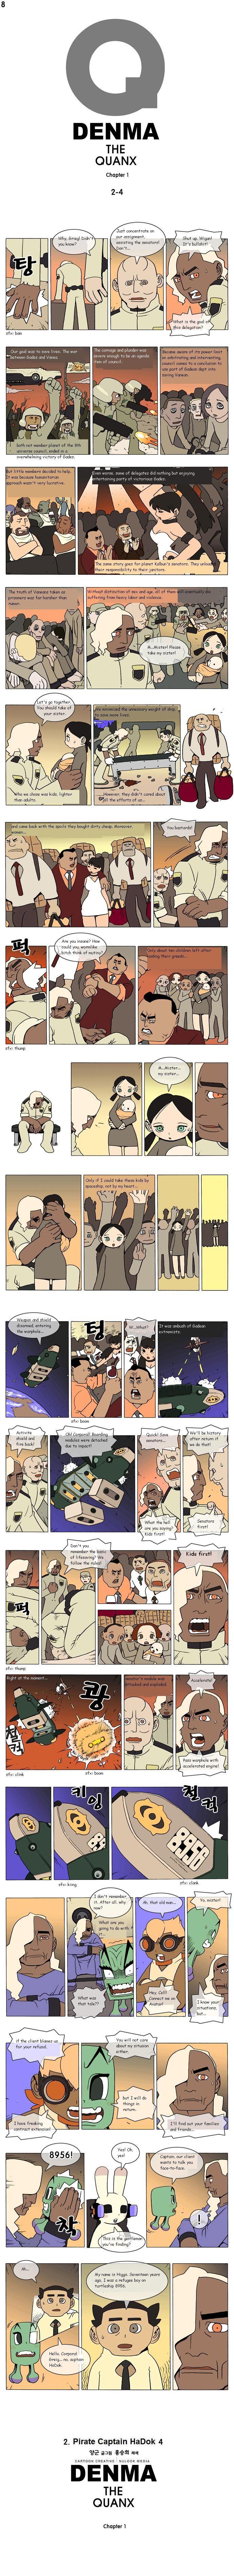 Denma 8 Page 1